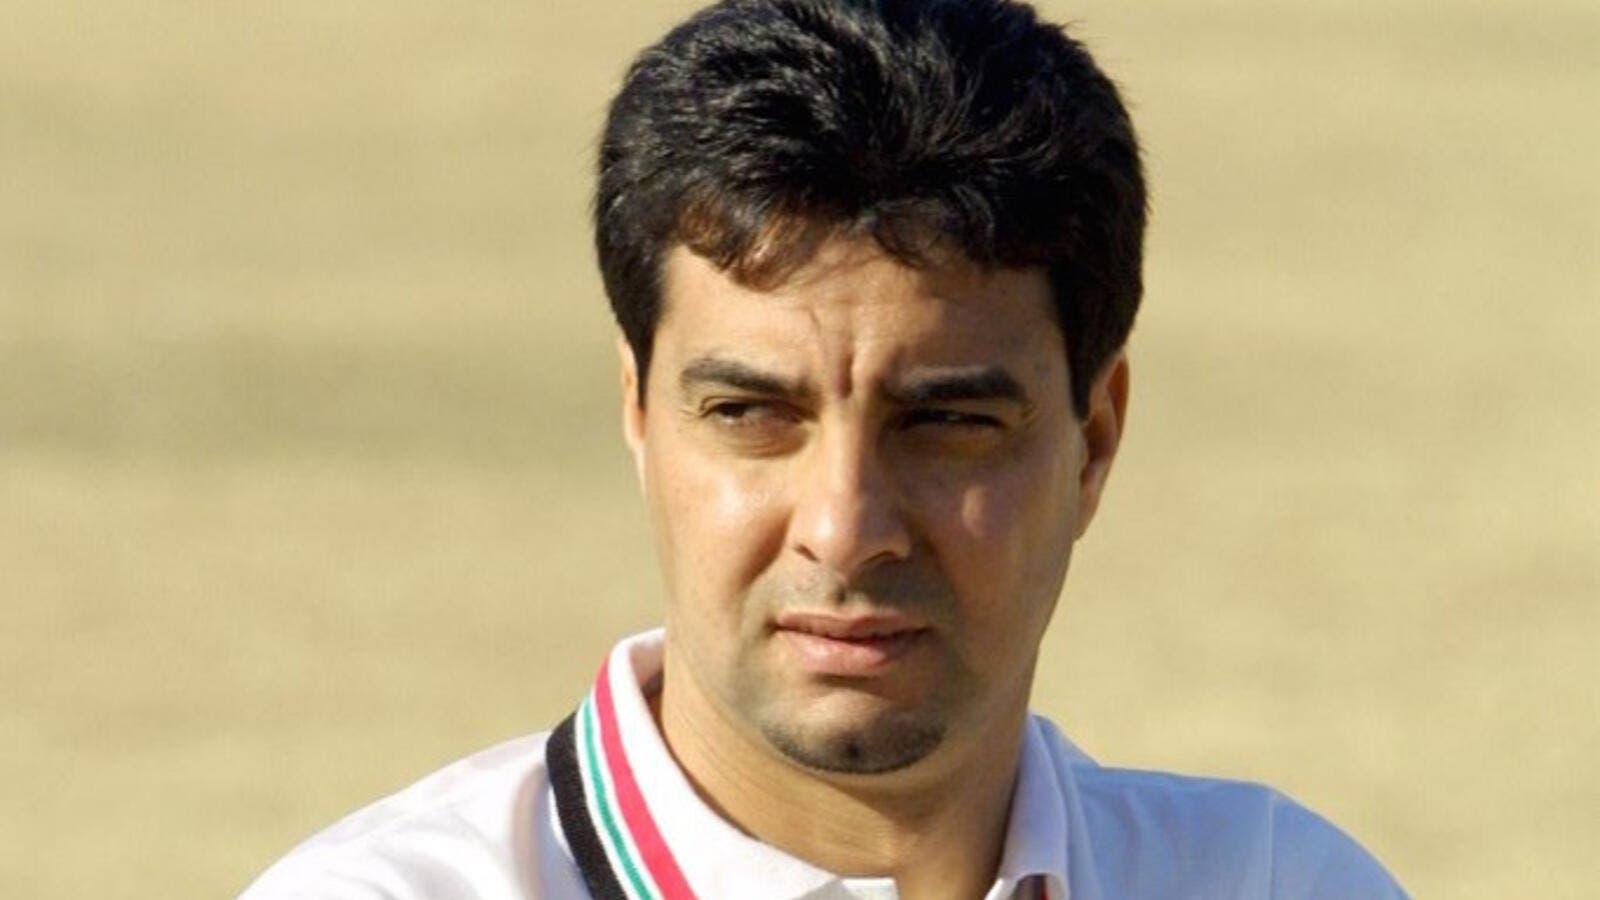 Ahmed Radhi, maior ídolo do futebol iraquiano